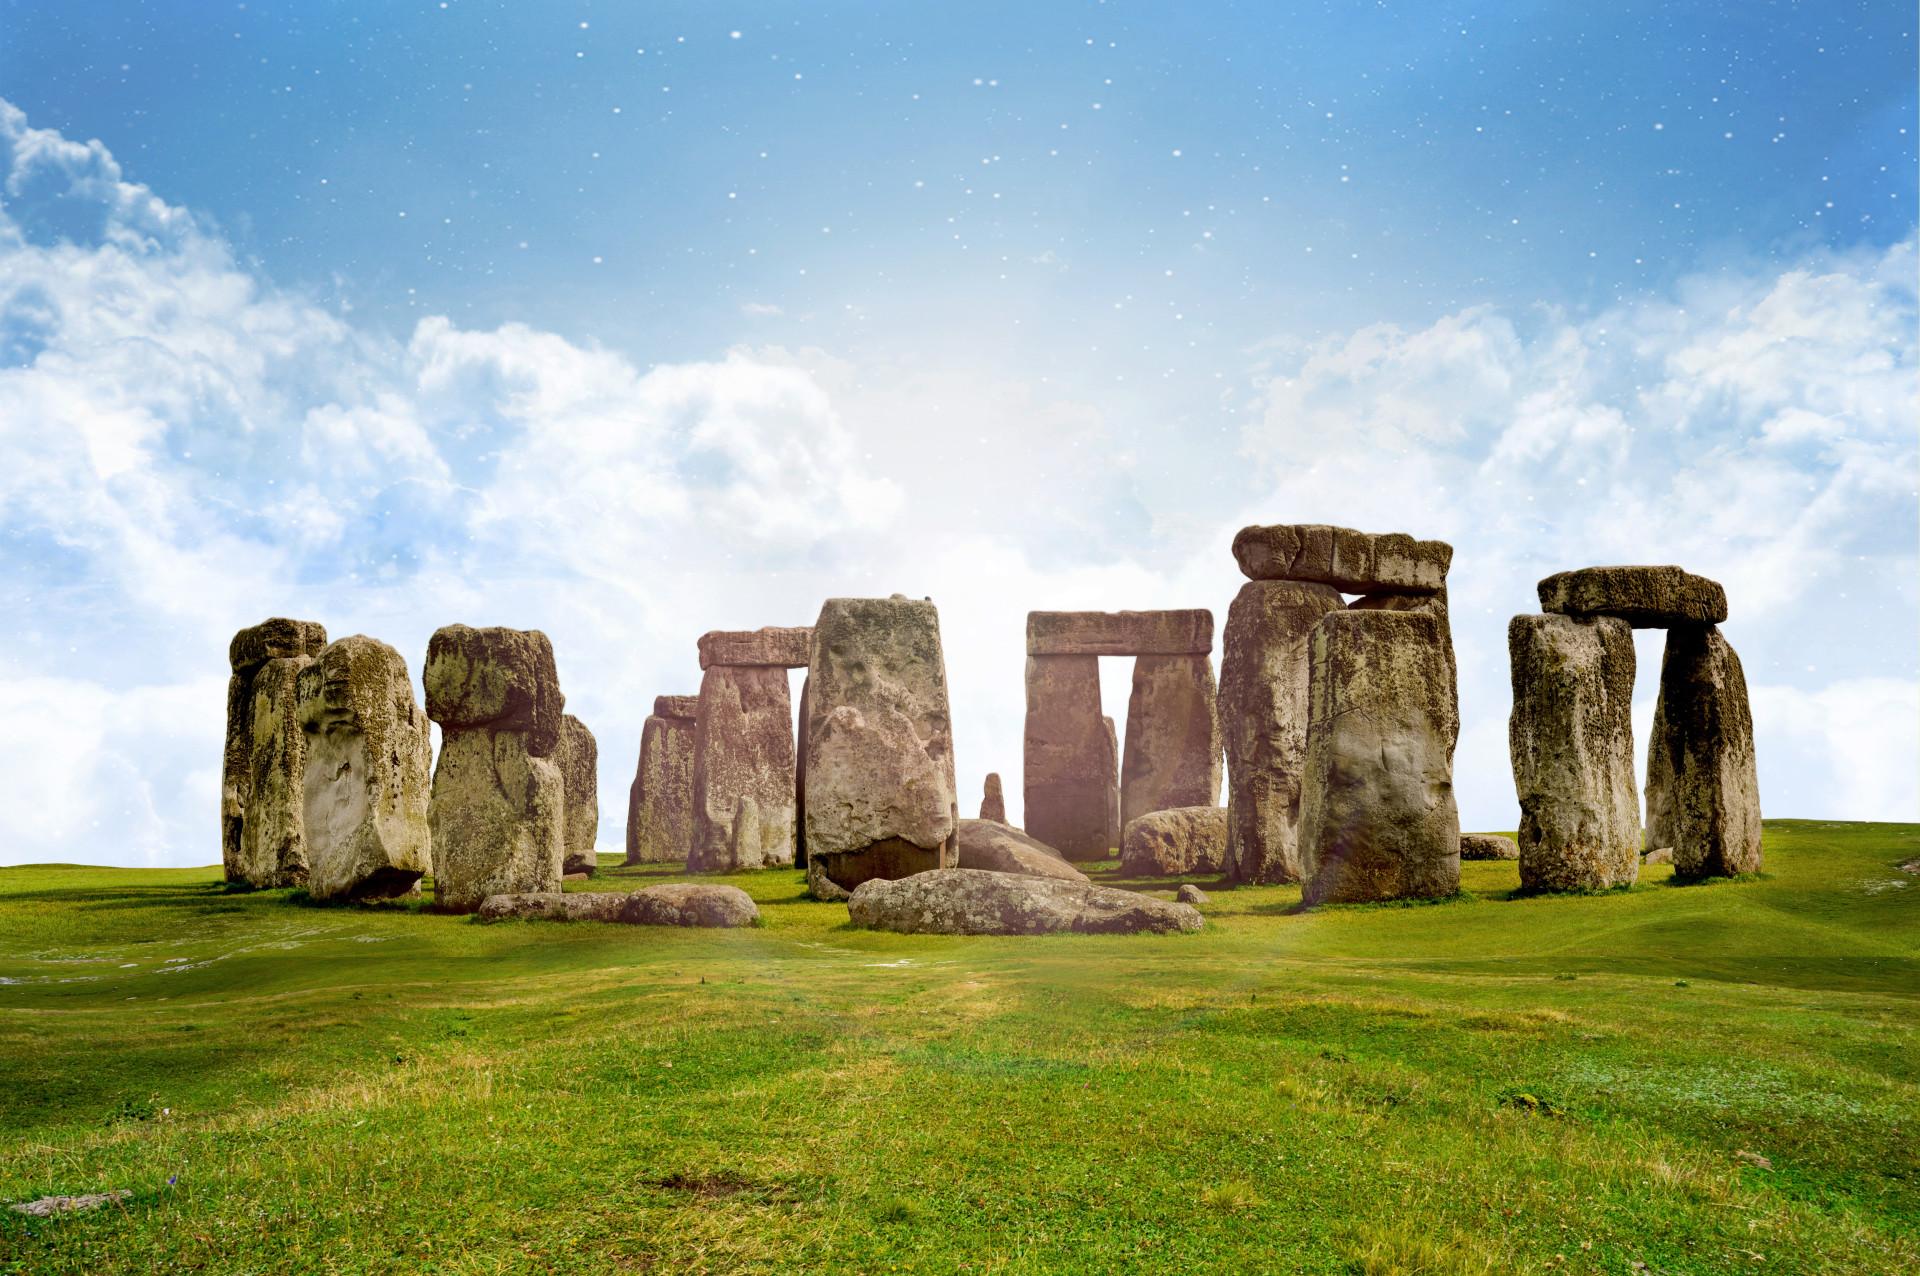 Descubra quais mistérios a Stonehenge guarda